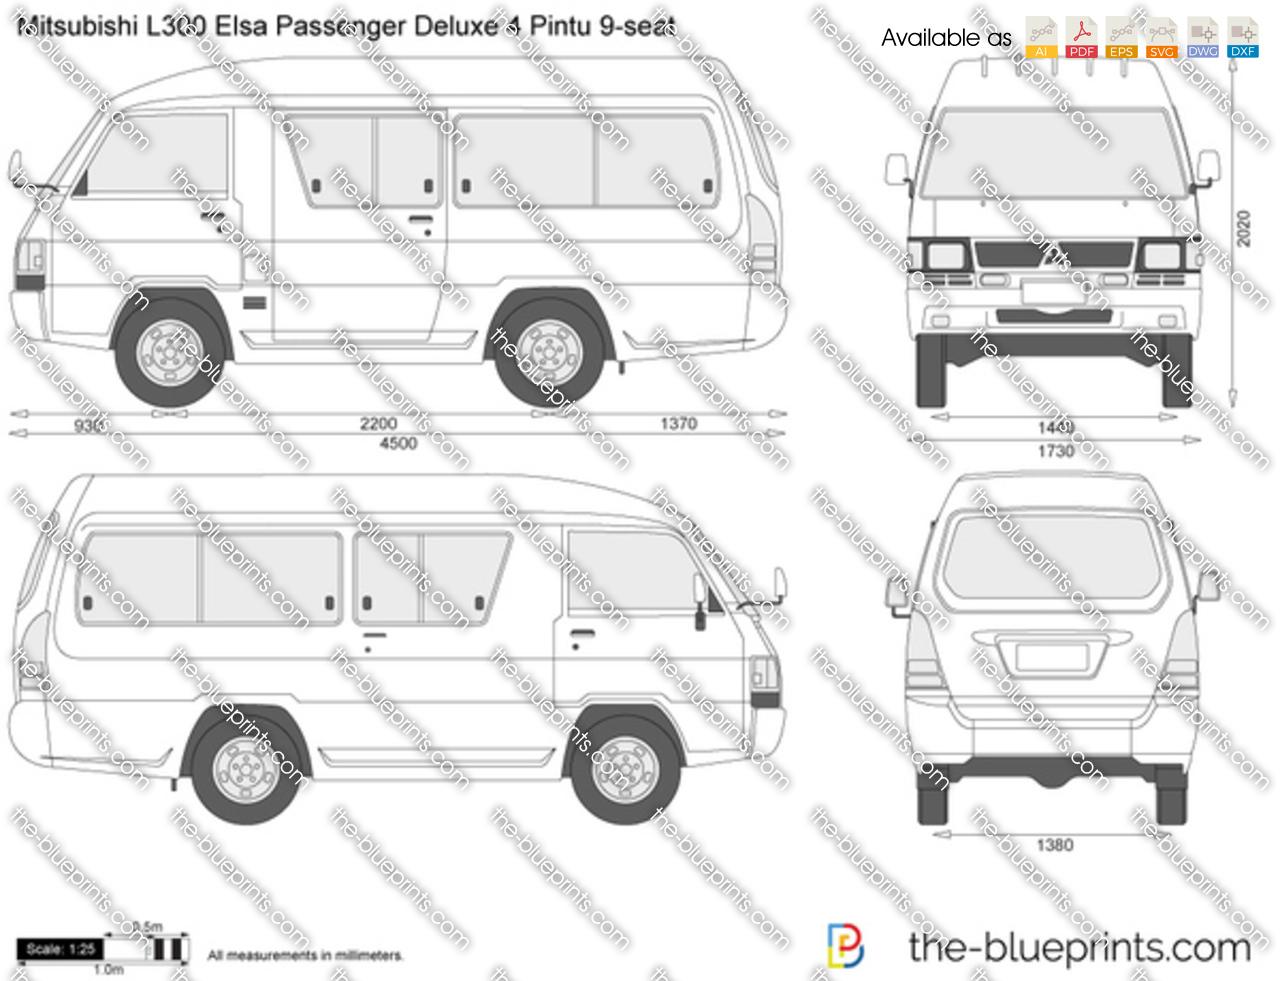 Mitsubishi L300 Elsa Passenger Deluxe 4 Pintu 9-seat